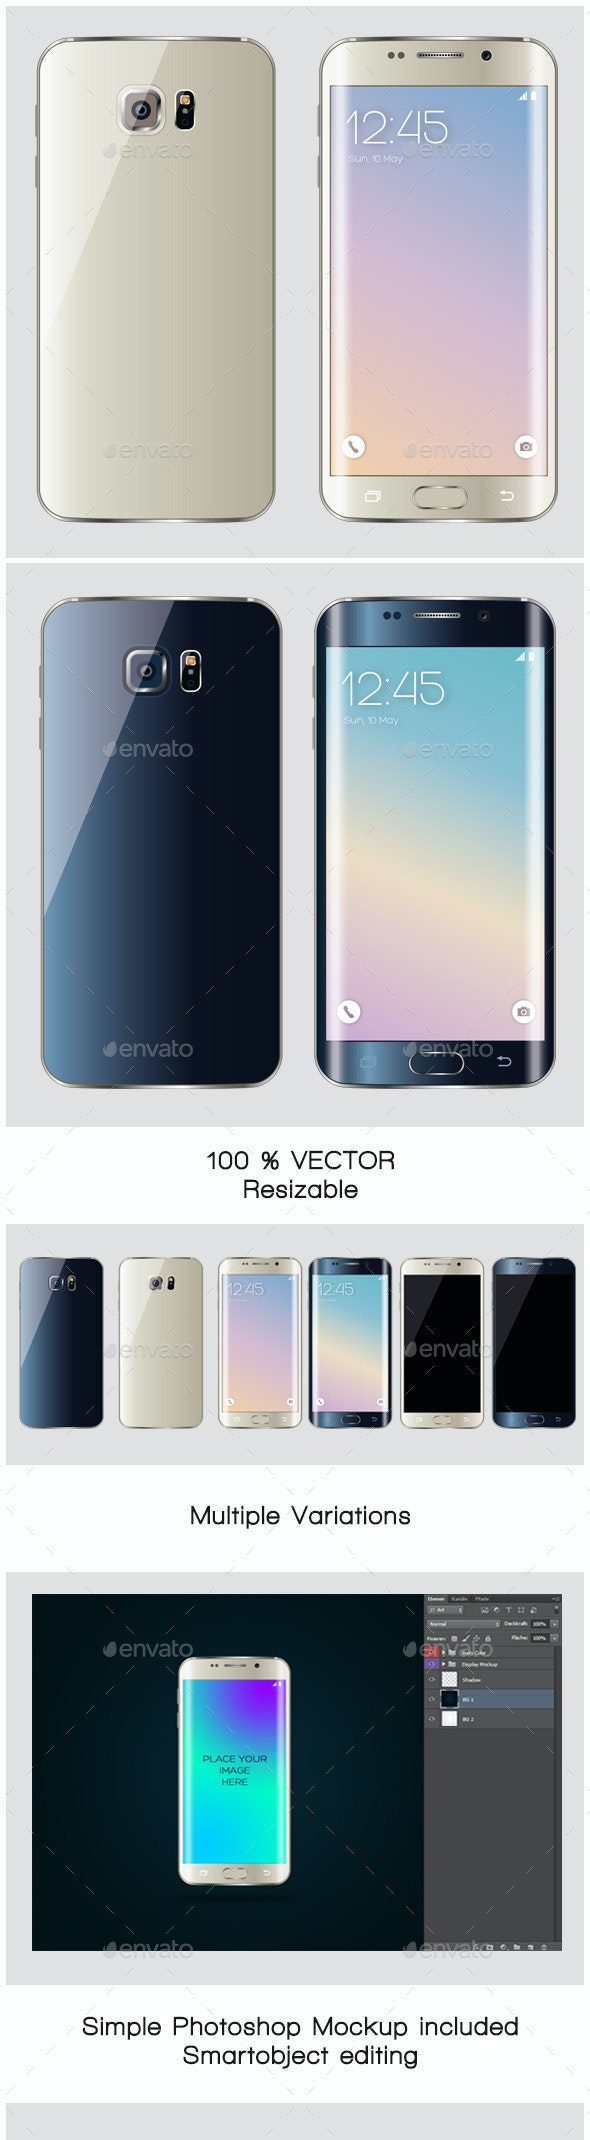 Realistic Premium Smartphone Vector + Mockup - Communications Technology